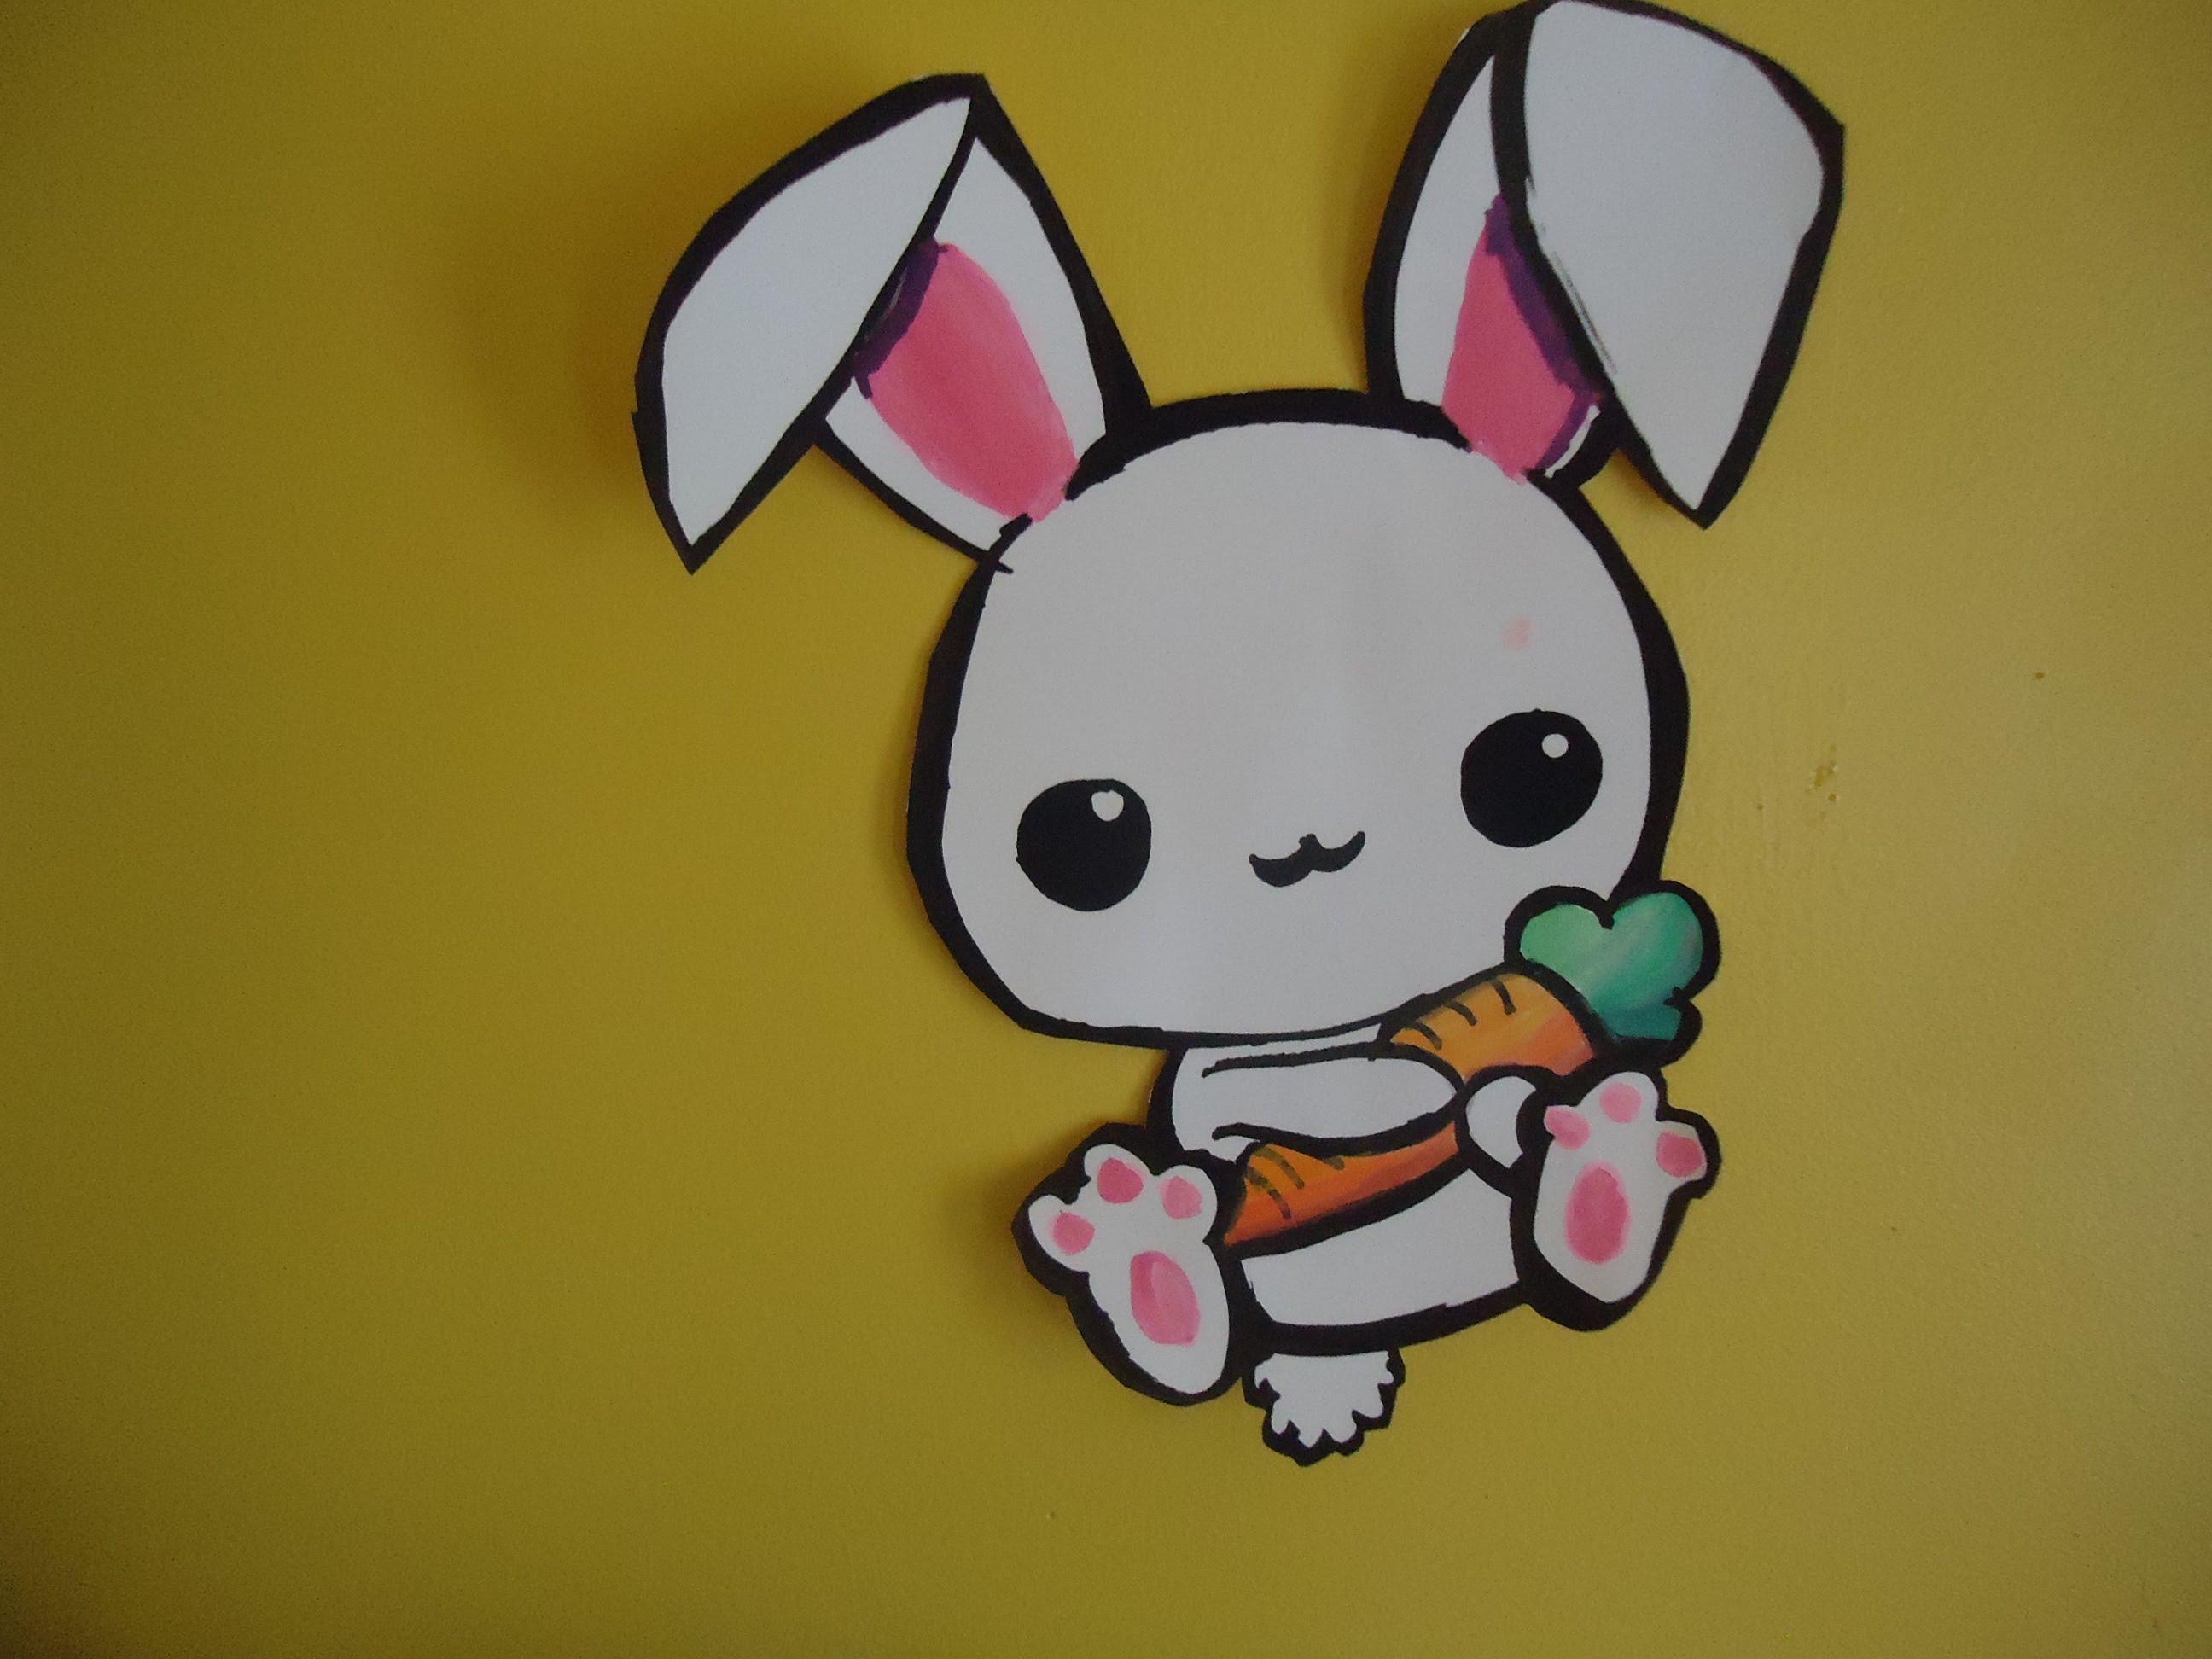 2592x1944 Cute Bunny